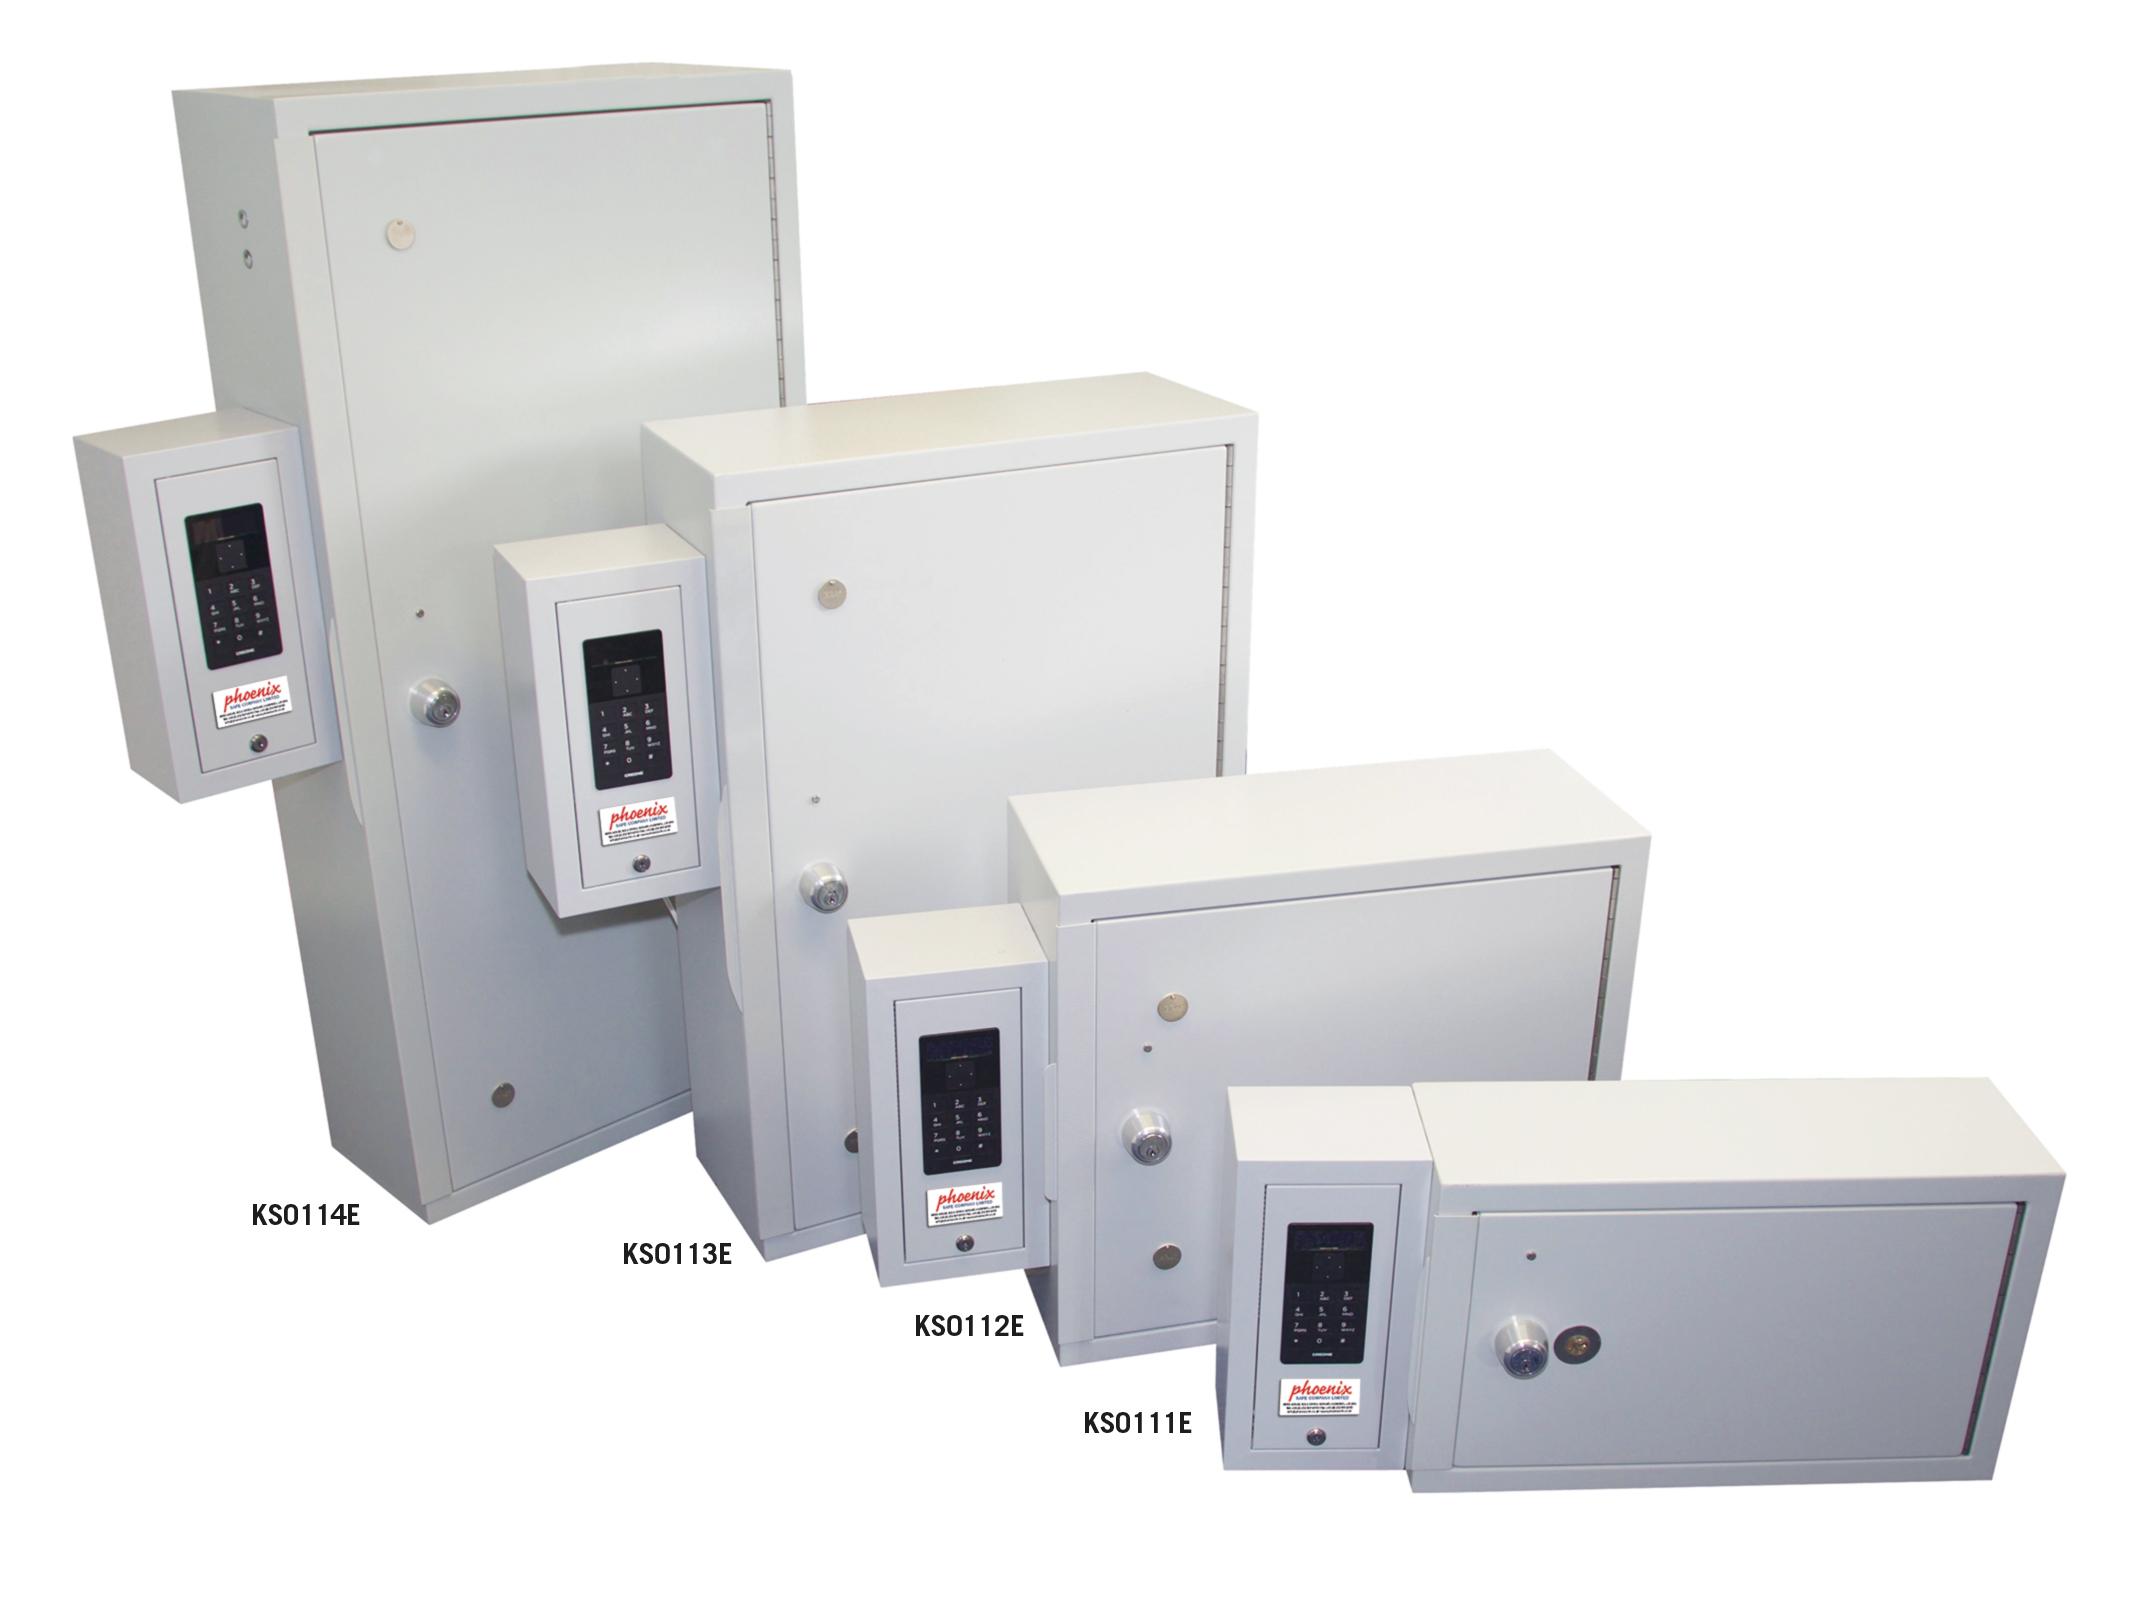 Smartbox KS0110 Series